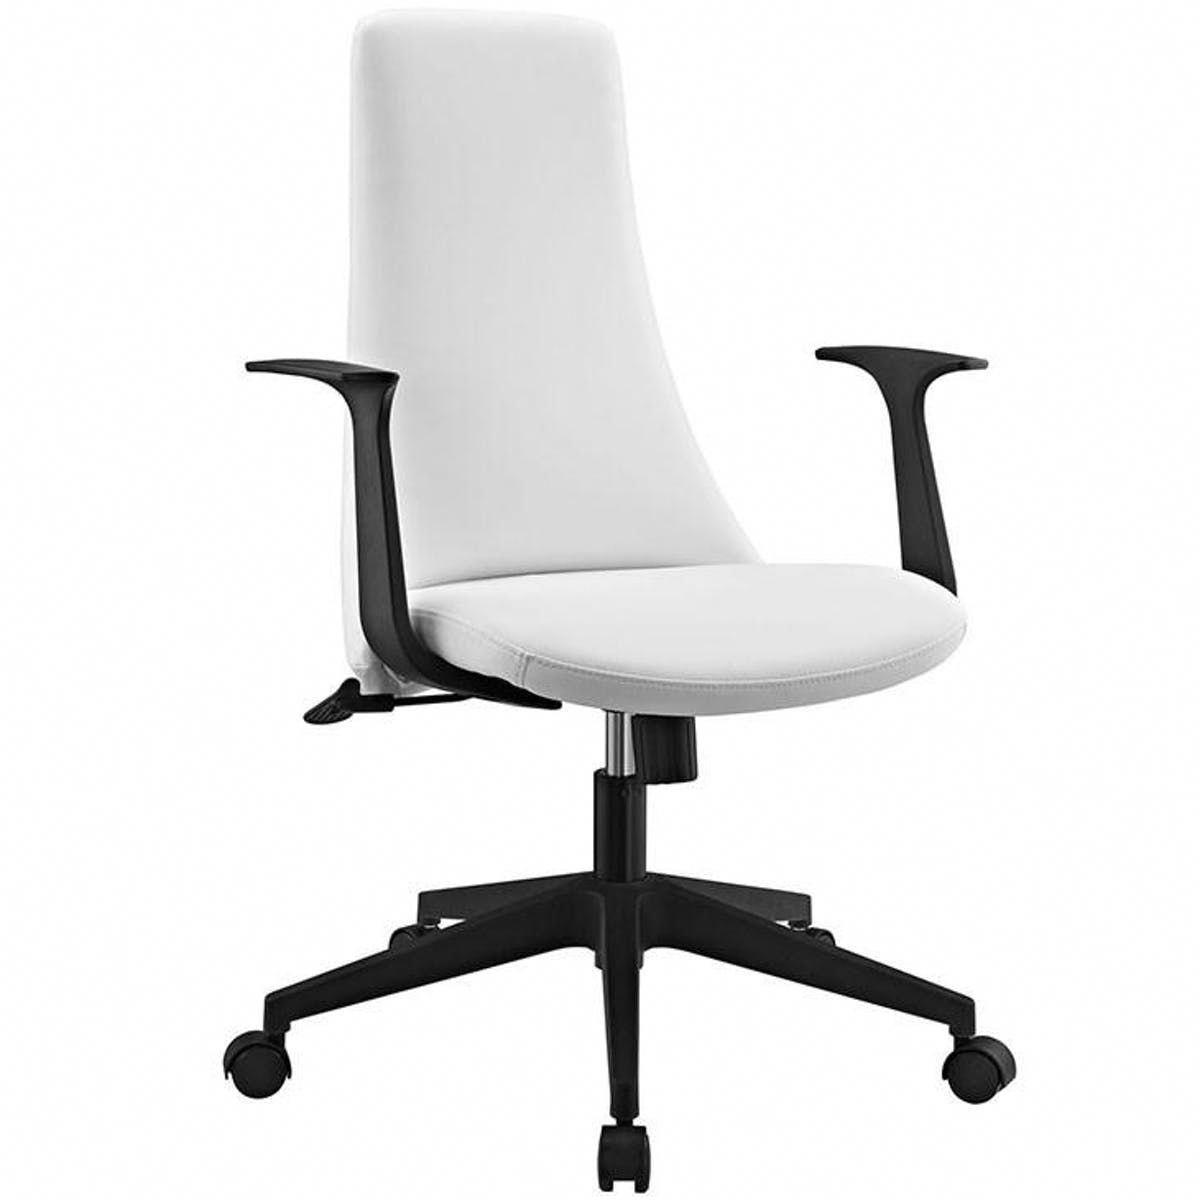 Comfortable Oversized Chair Whitediningroomchairs